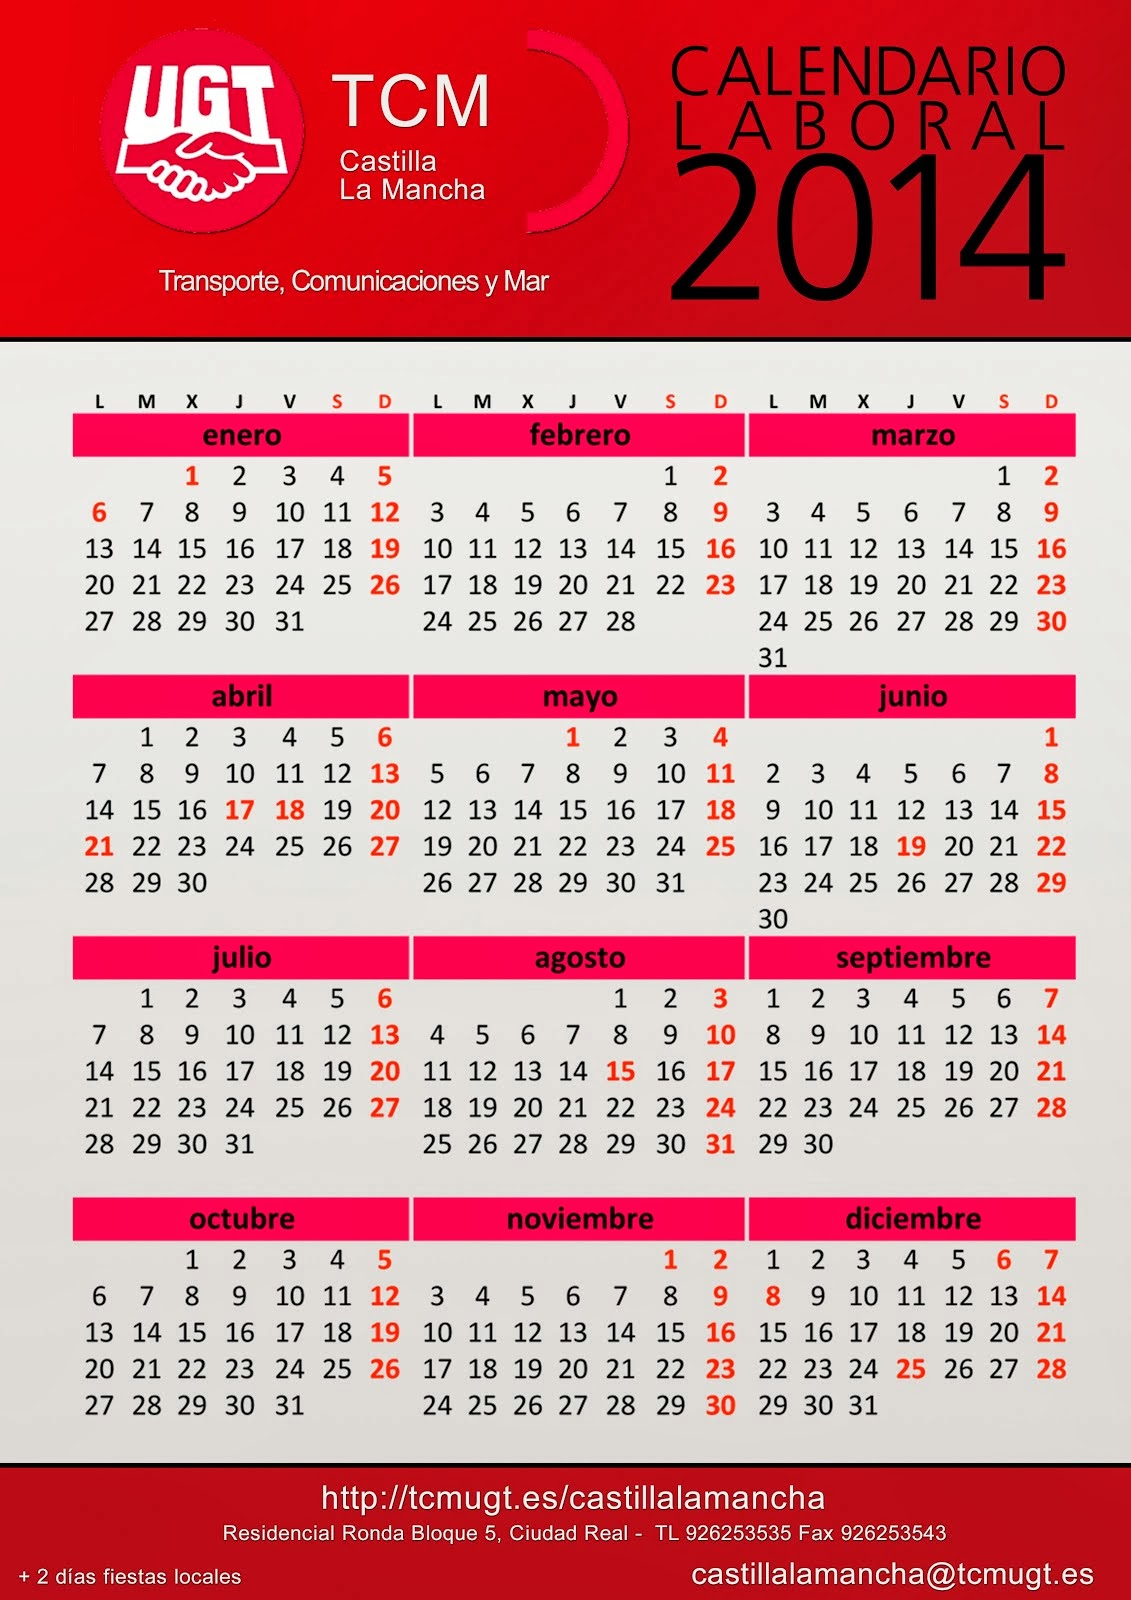 CALENDARIO LABORAL 2014 CLM